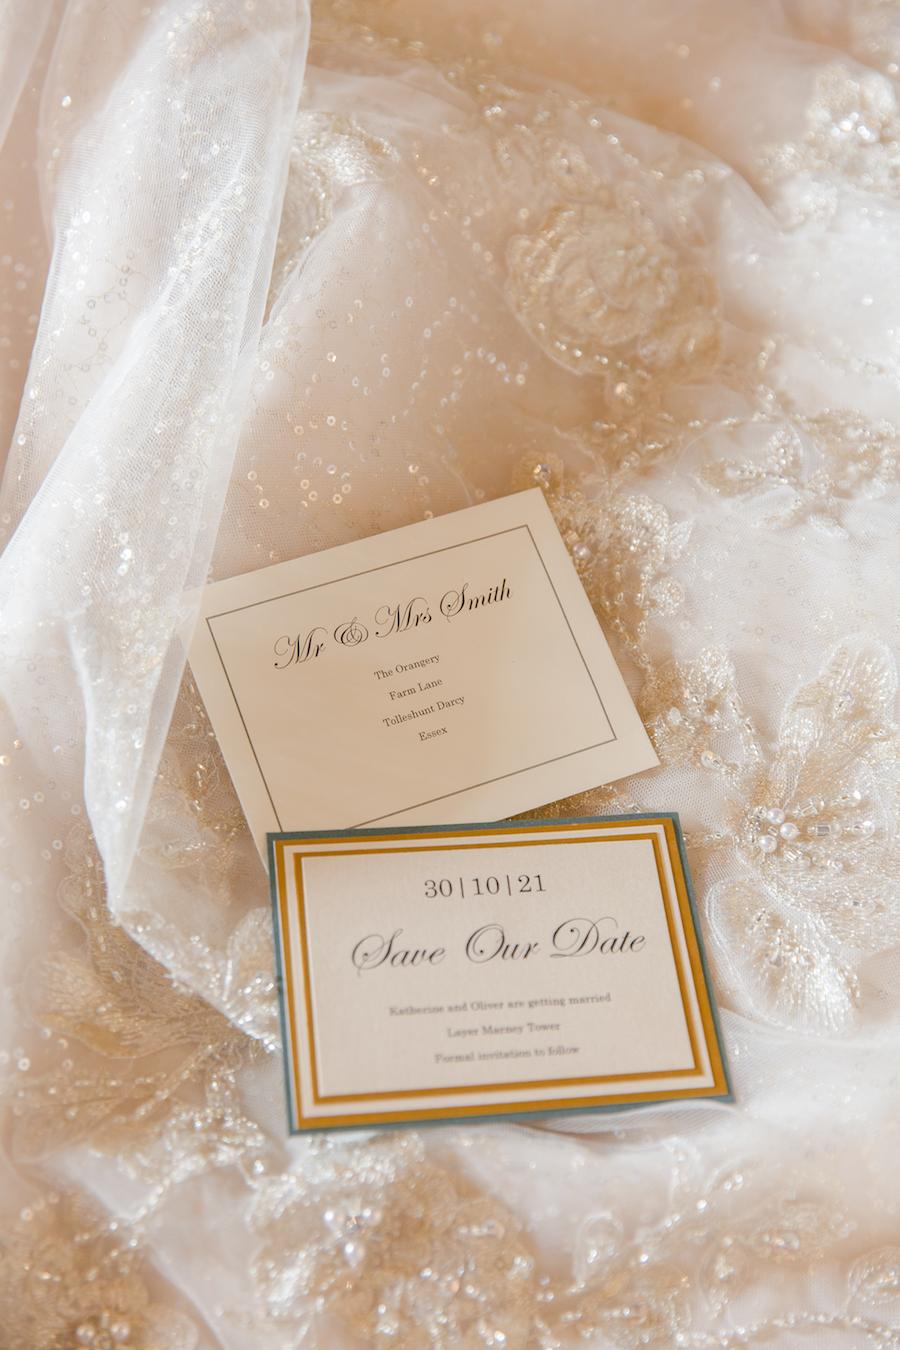 Jewel toned autumn wedding vibes from Layer Marney, image credit Ayshea Goldberg Photography (32)